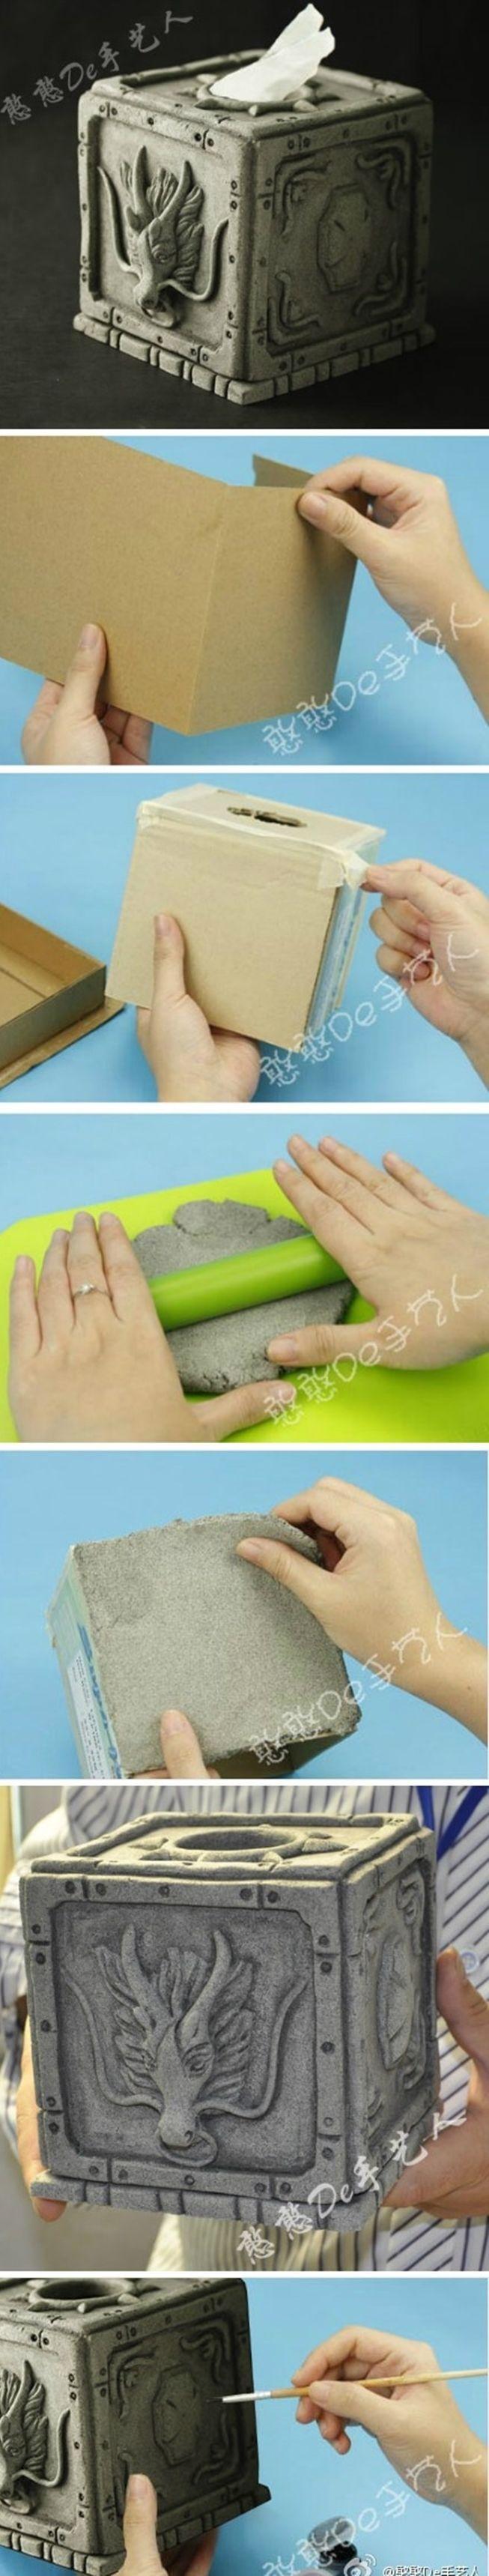 DIY Tissue Box - really cool